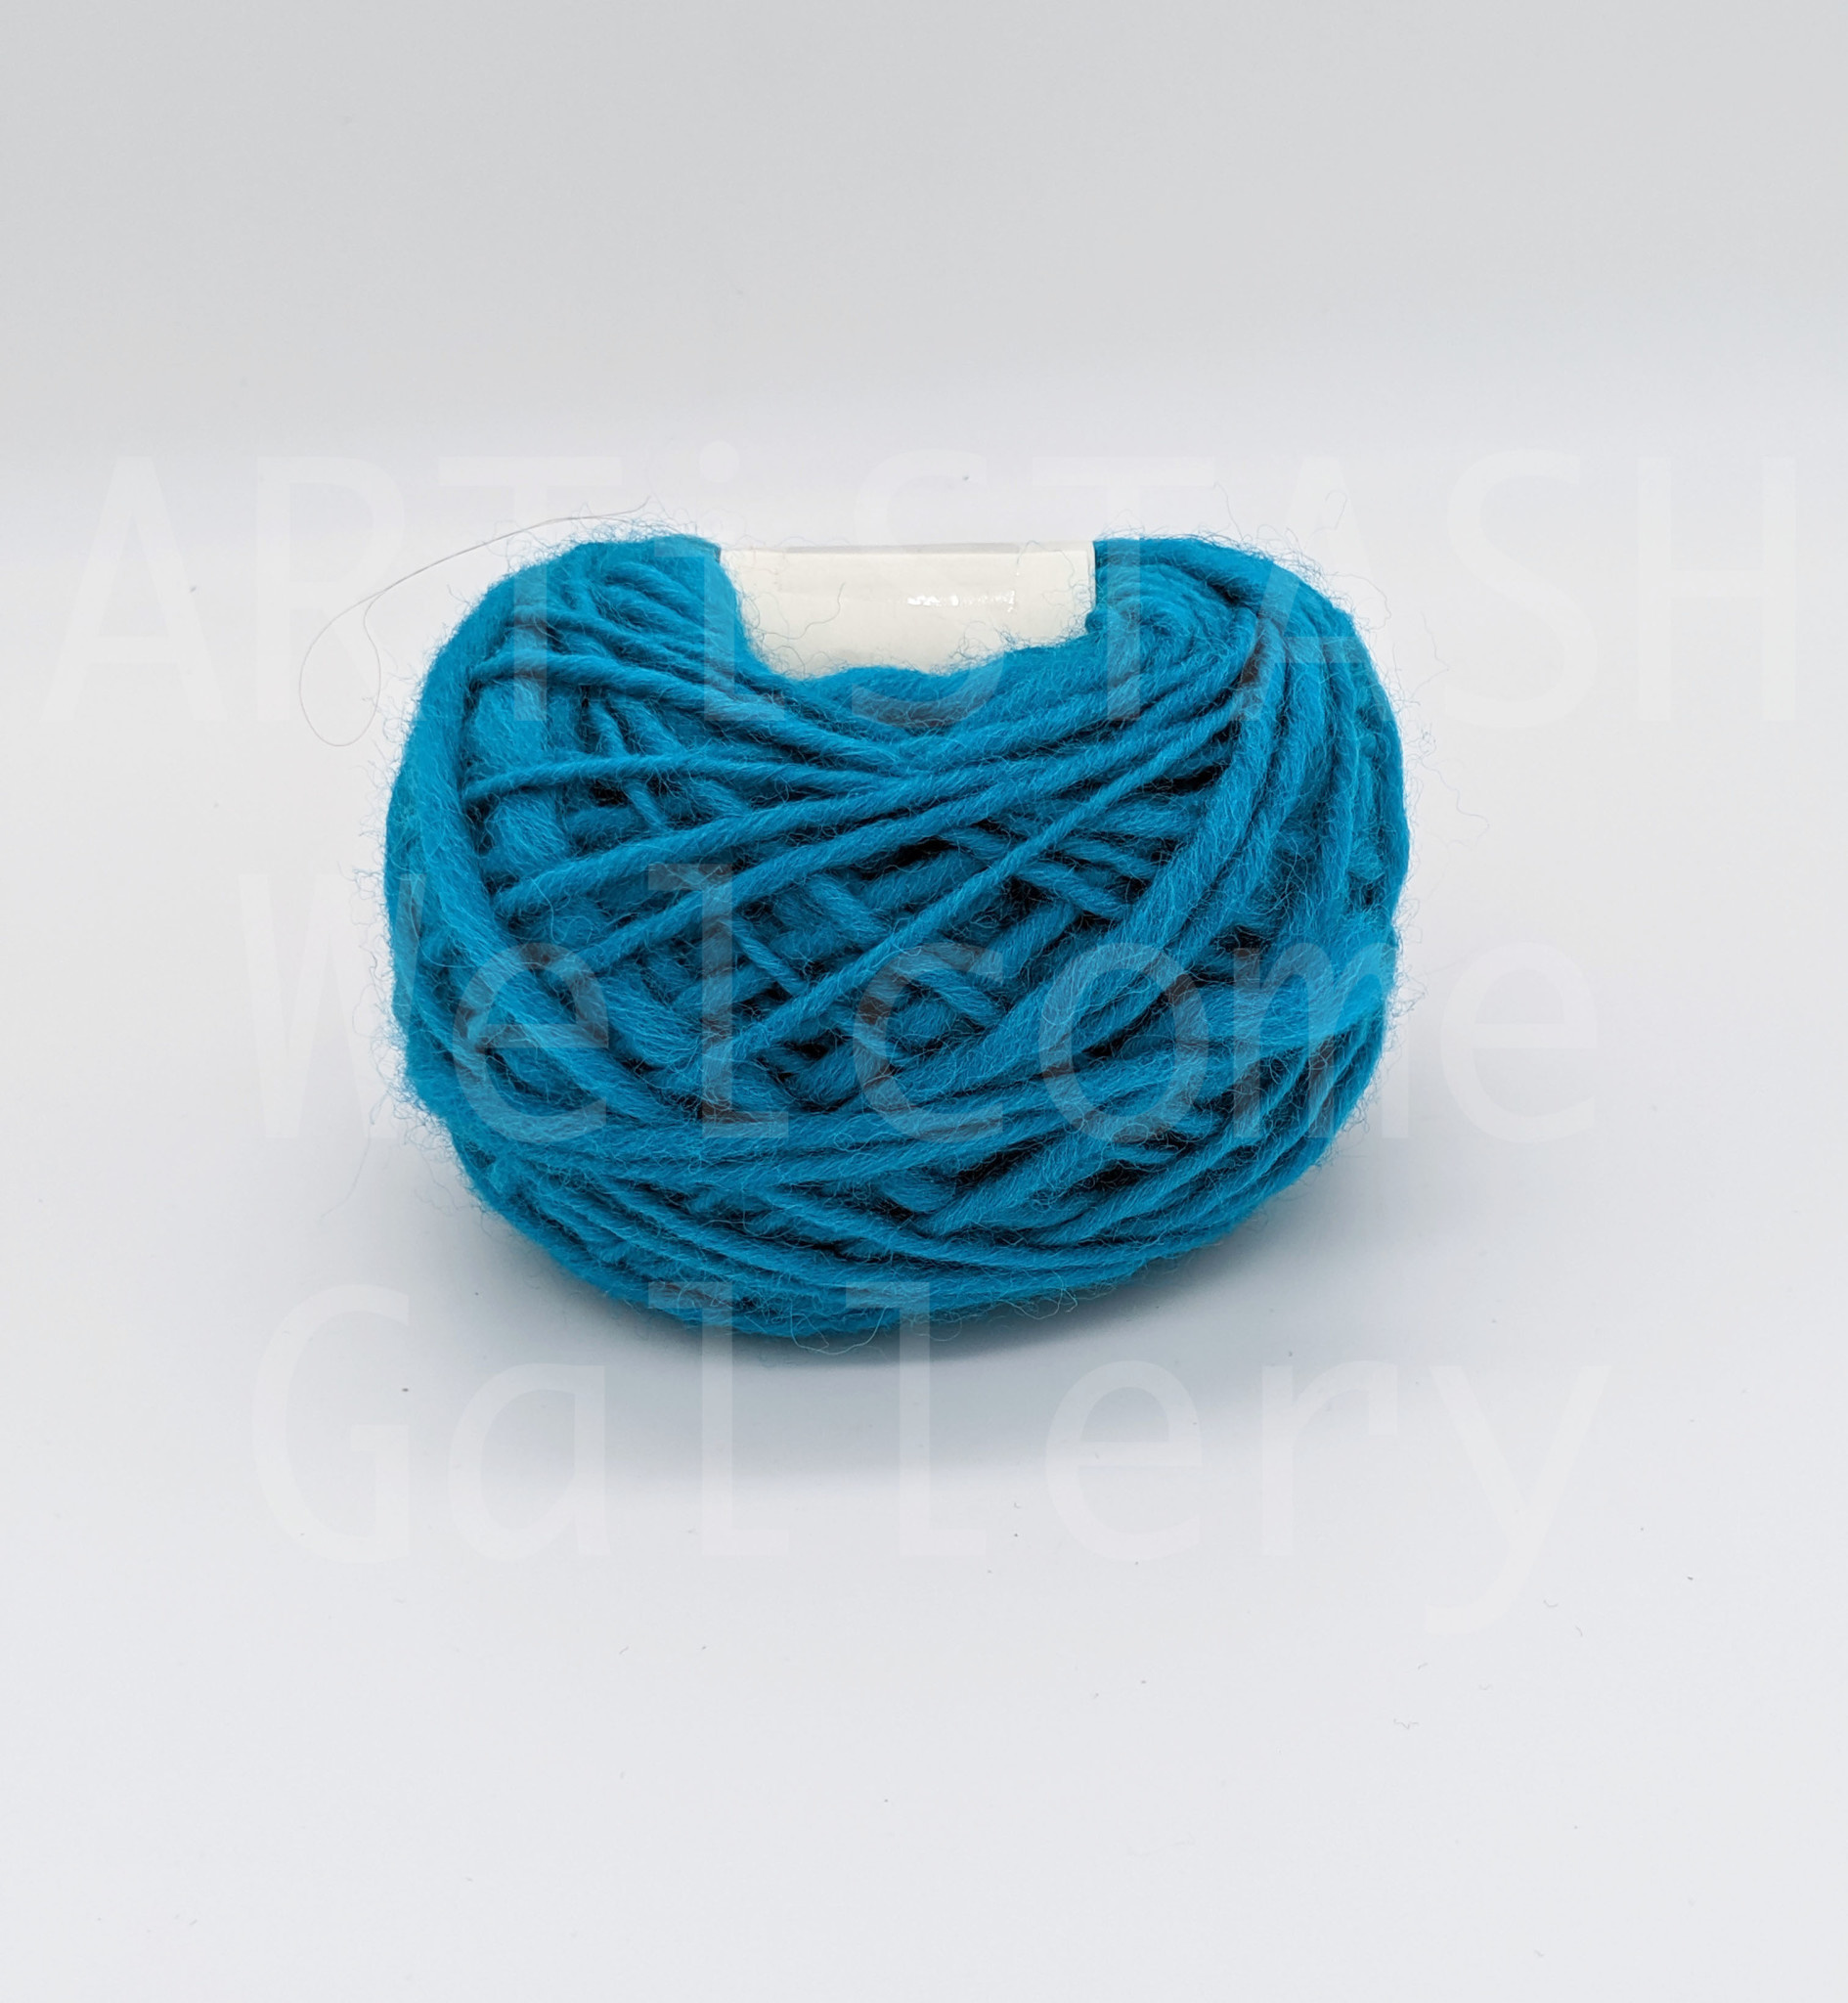 Just Sabine Hand Spun Yarn, Desert Turquoise, 34 Yards